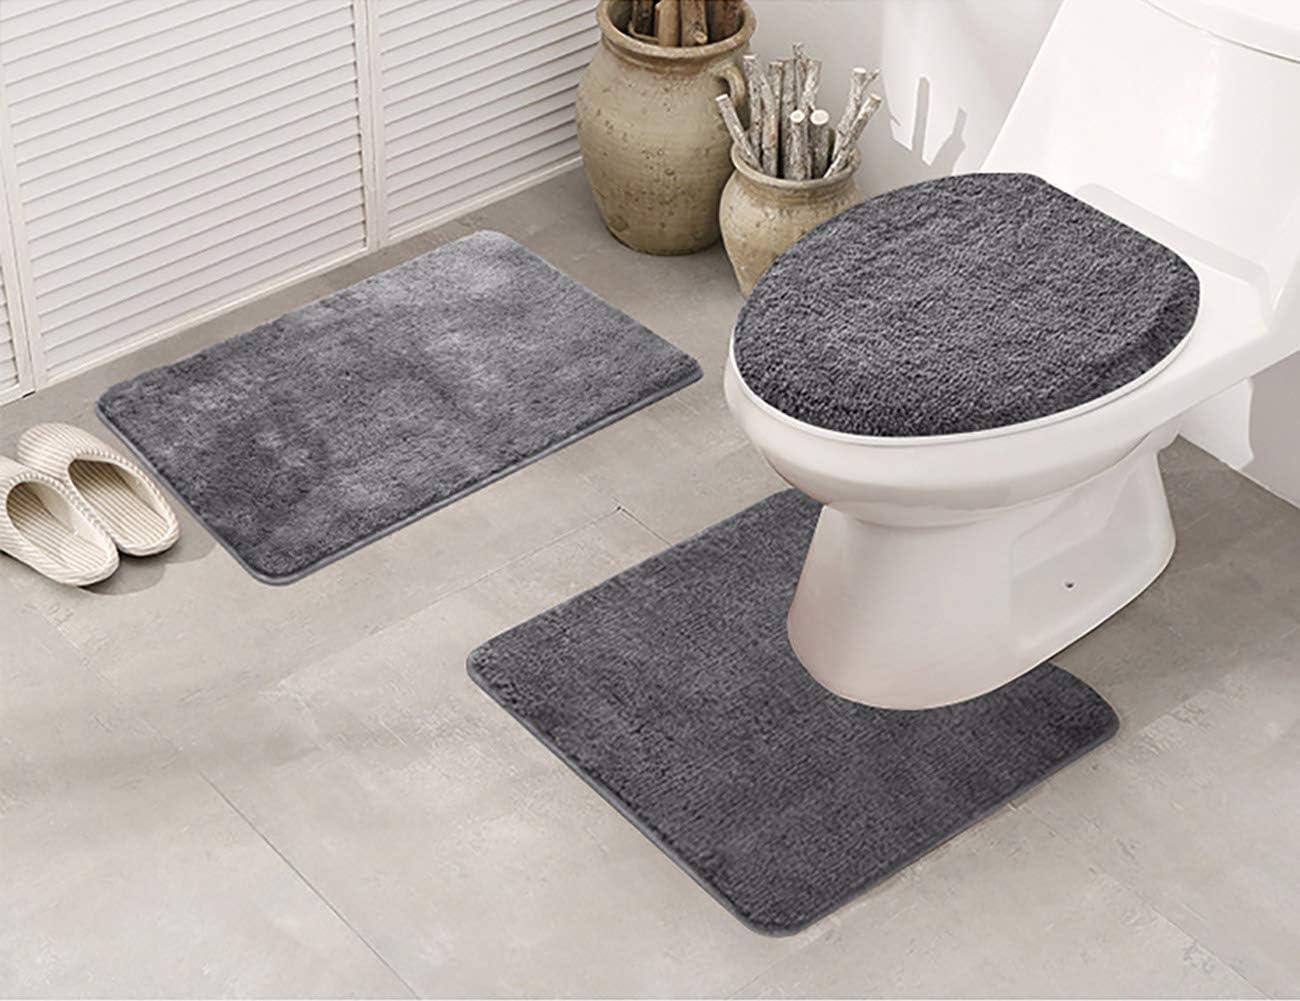 3PCS Bath Set Non-slip Rug Soft Pedestal Mat Toilet Lid Cover Carpet Bathroom US